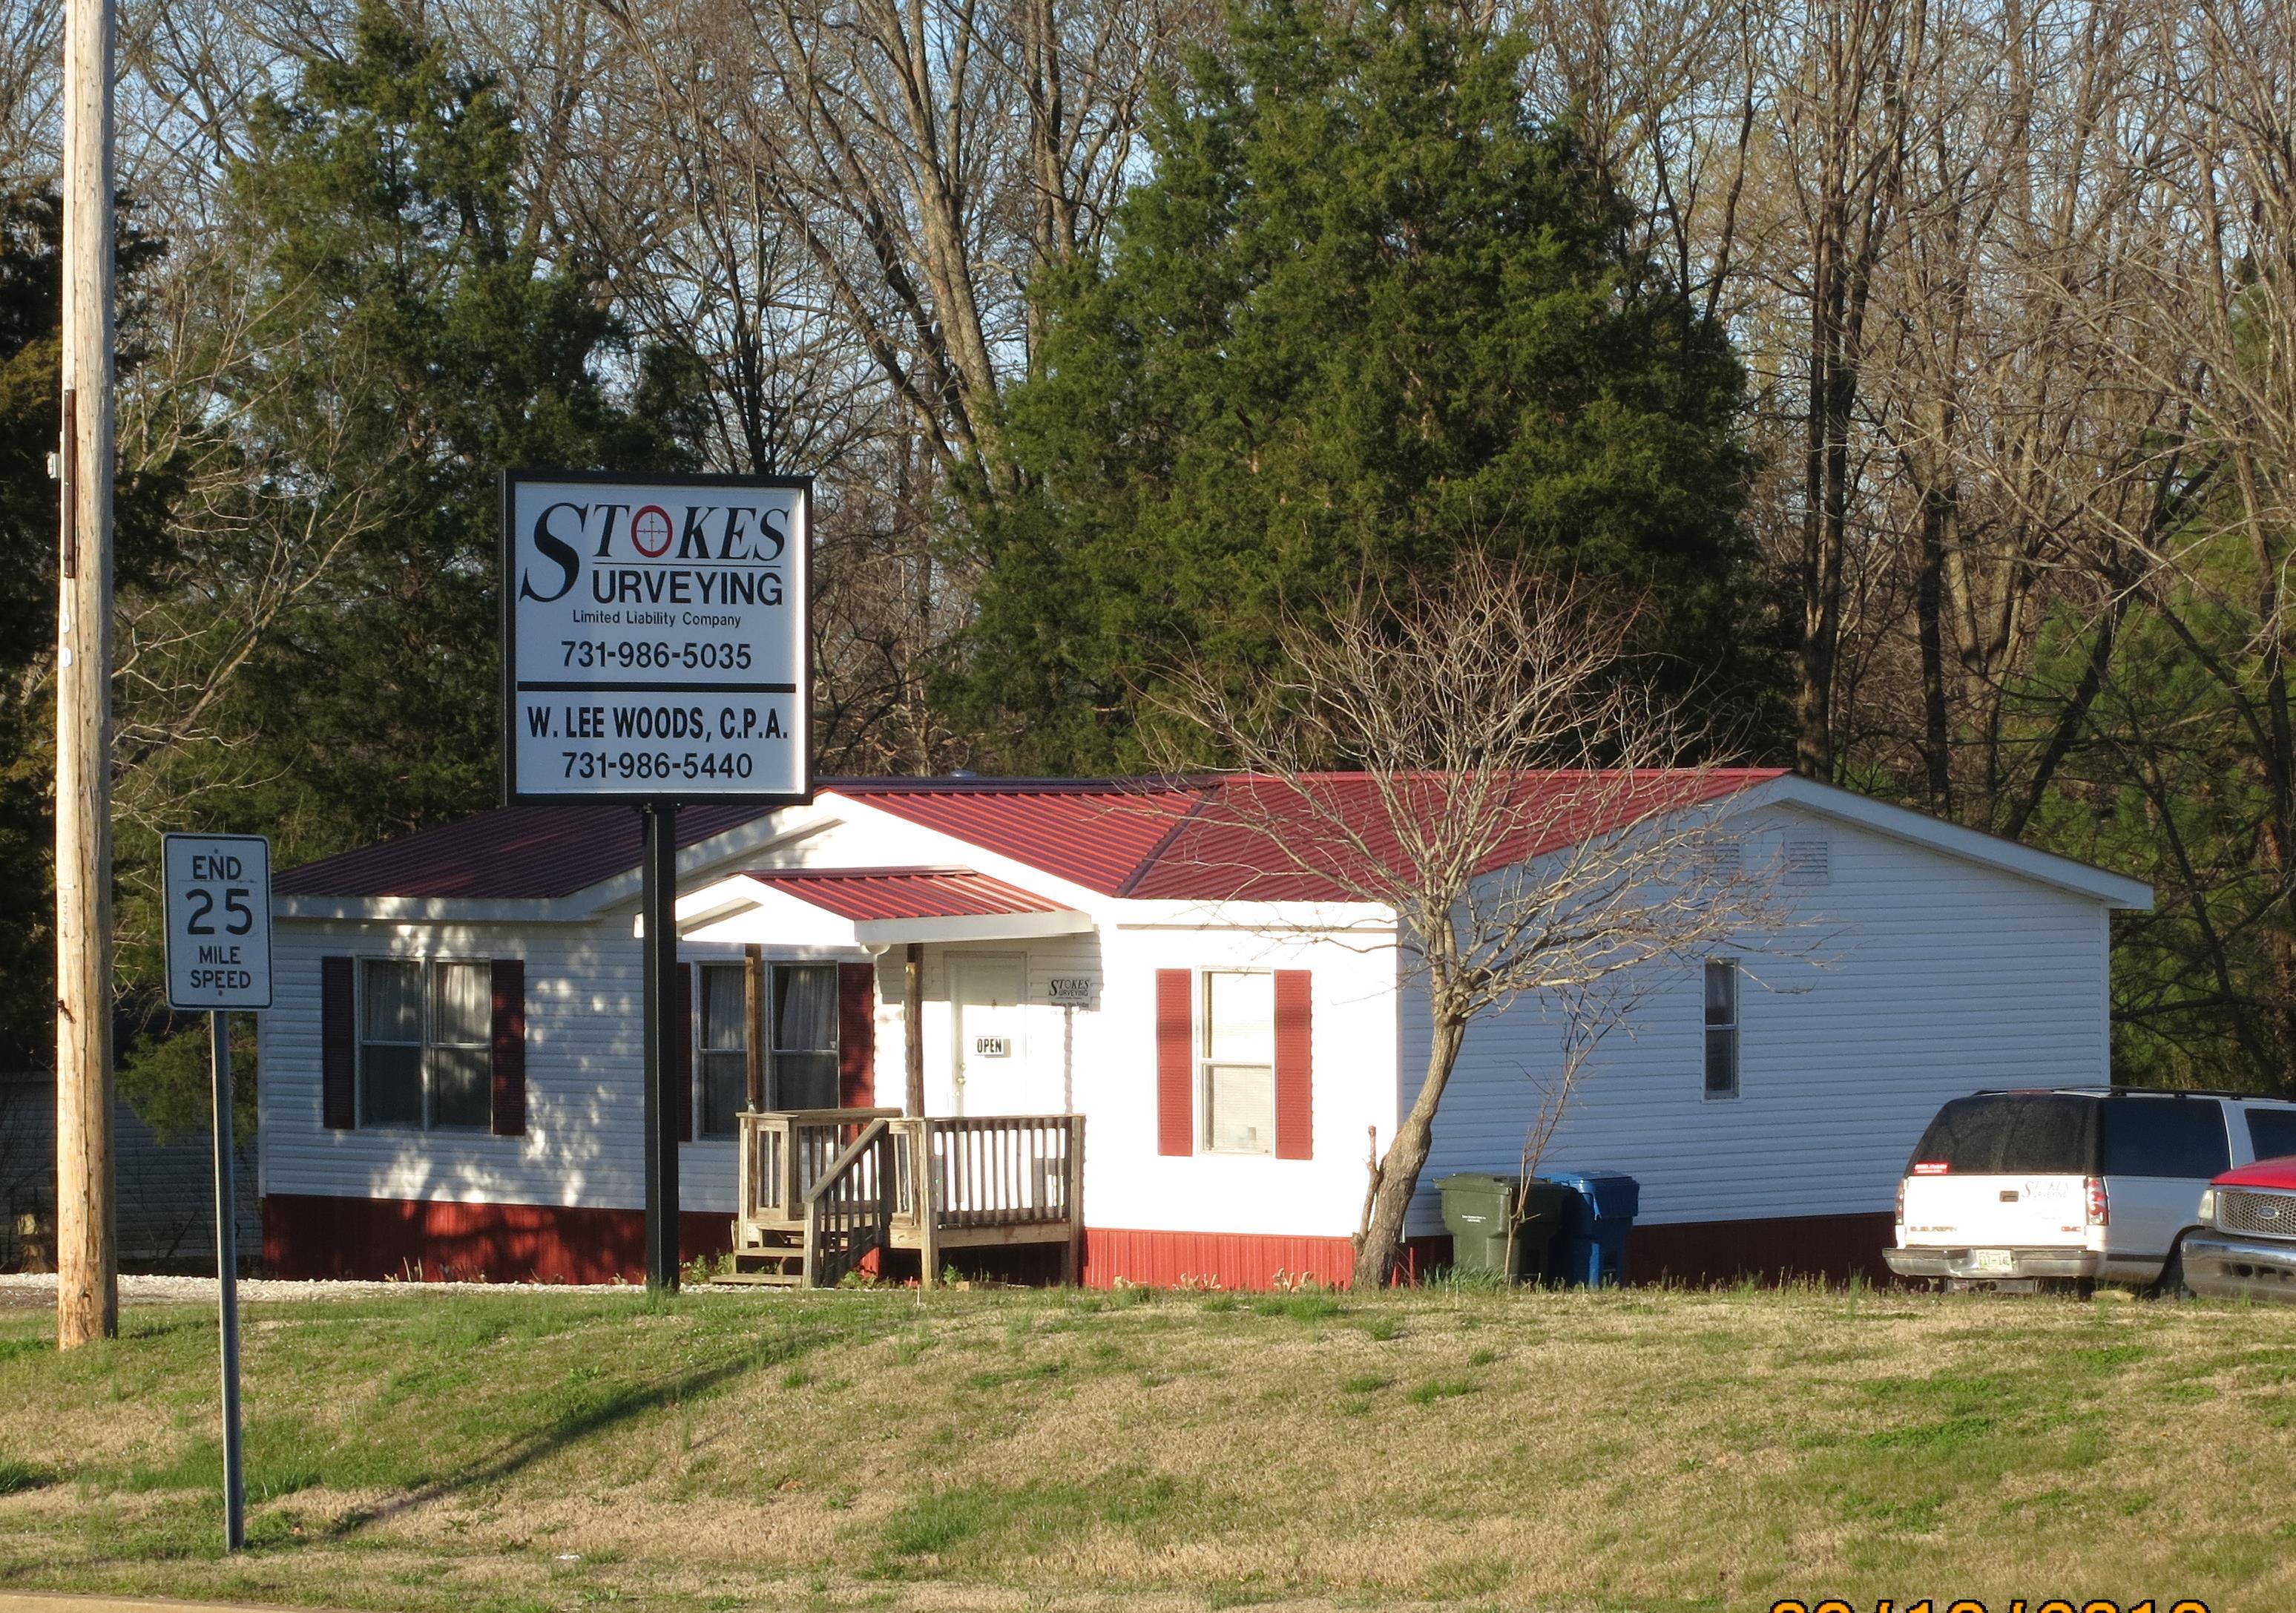 Tennessee carroll county clarksburg - Stokes Surveying 2016